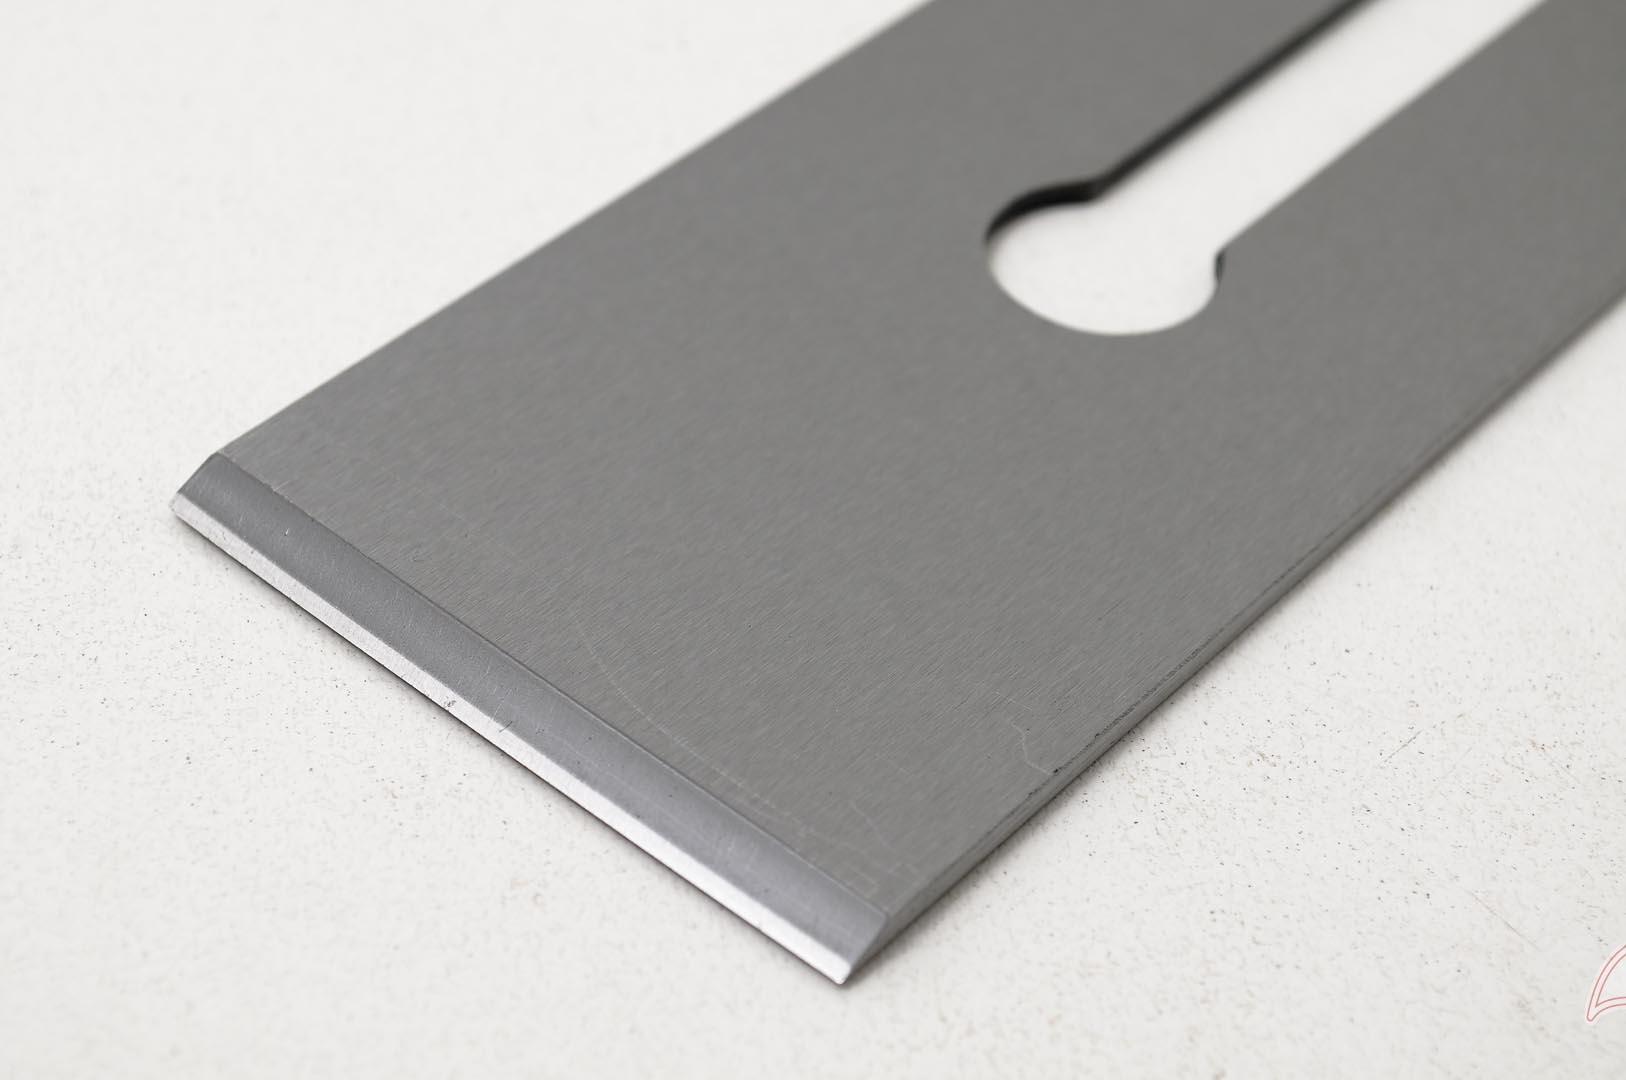 TsABS60-Cuchilla de repuesto cepillo Stanley 6, 7, 60mm Aogami Blue Super acero laminado TsABS60-max-2.